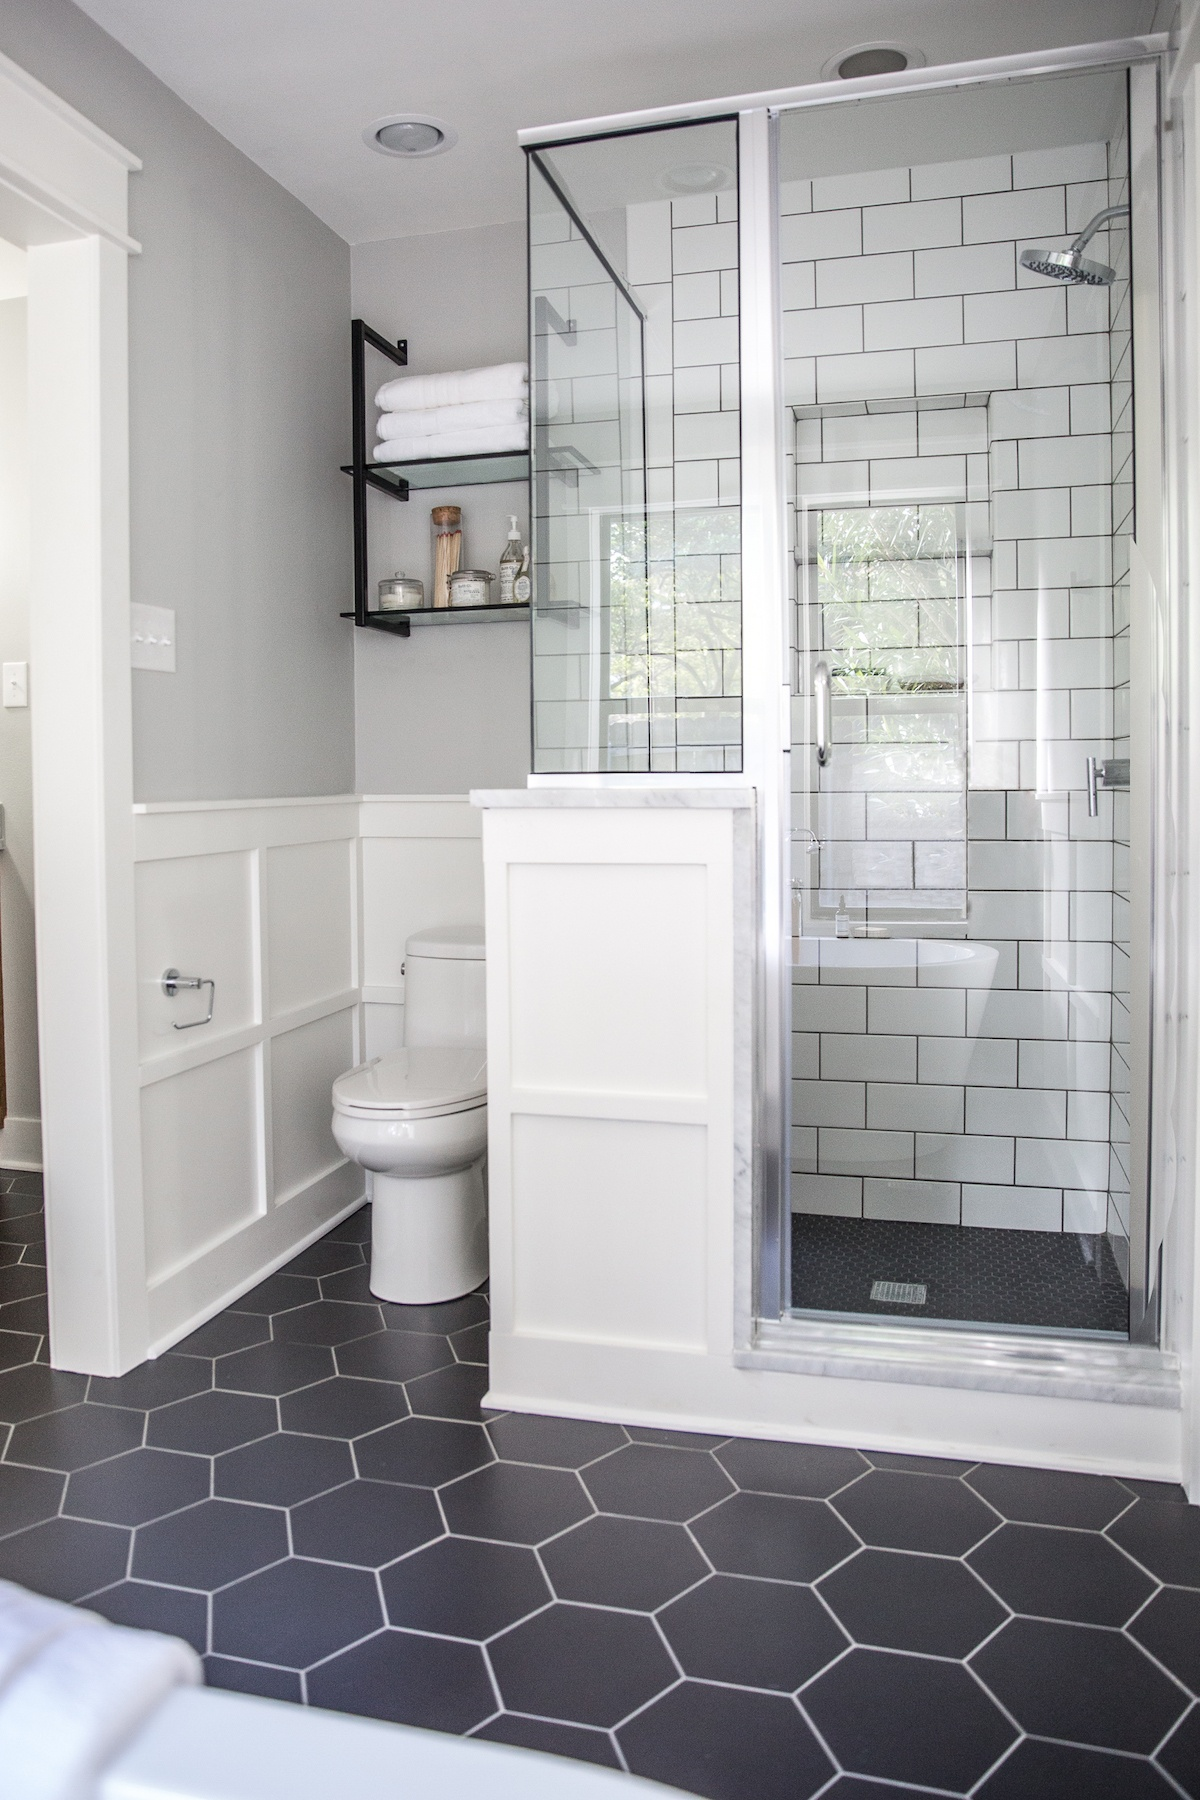 Ванная комната с душевым боксом